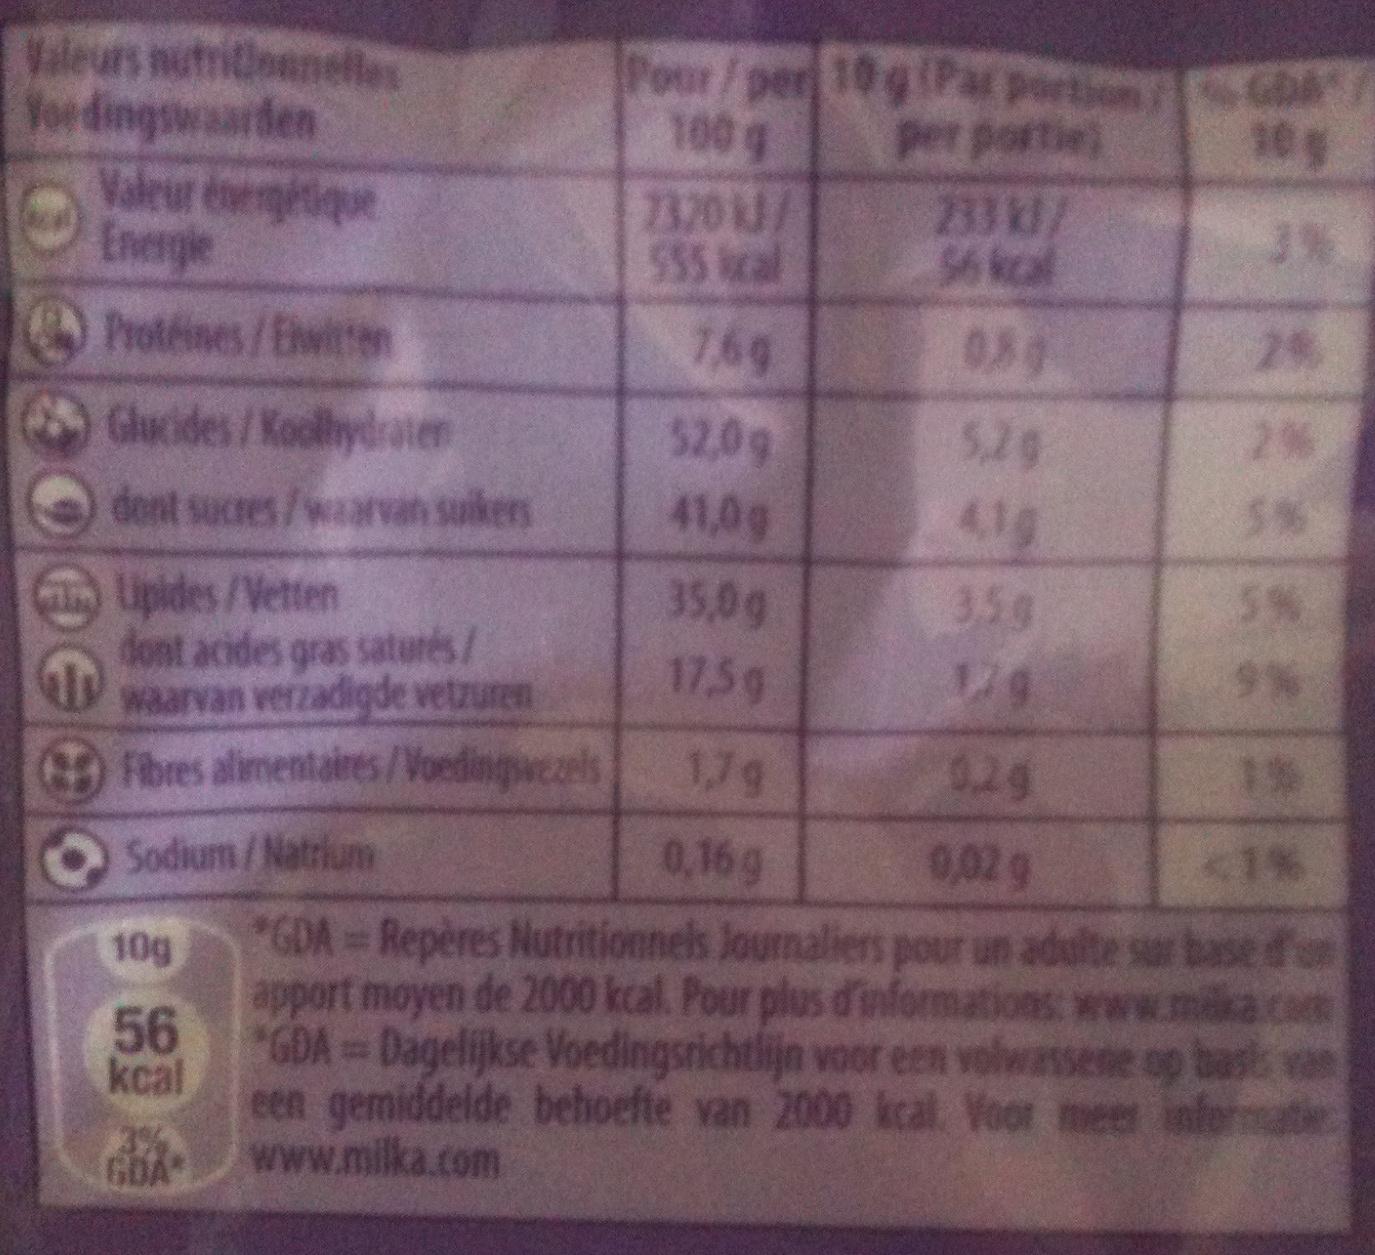 Milka - Crispello - Saveur Chocolat - Informations nutritionnelles - fr